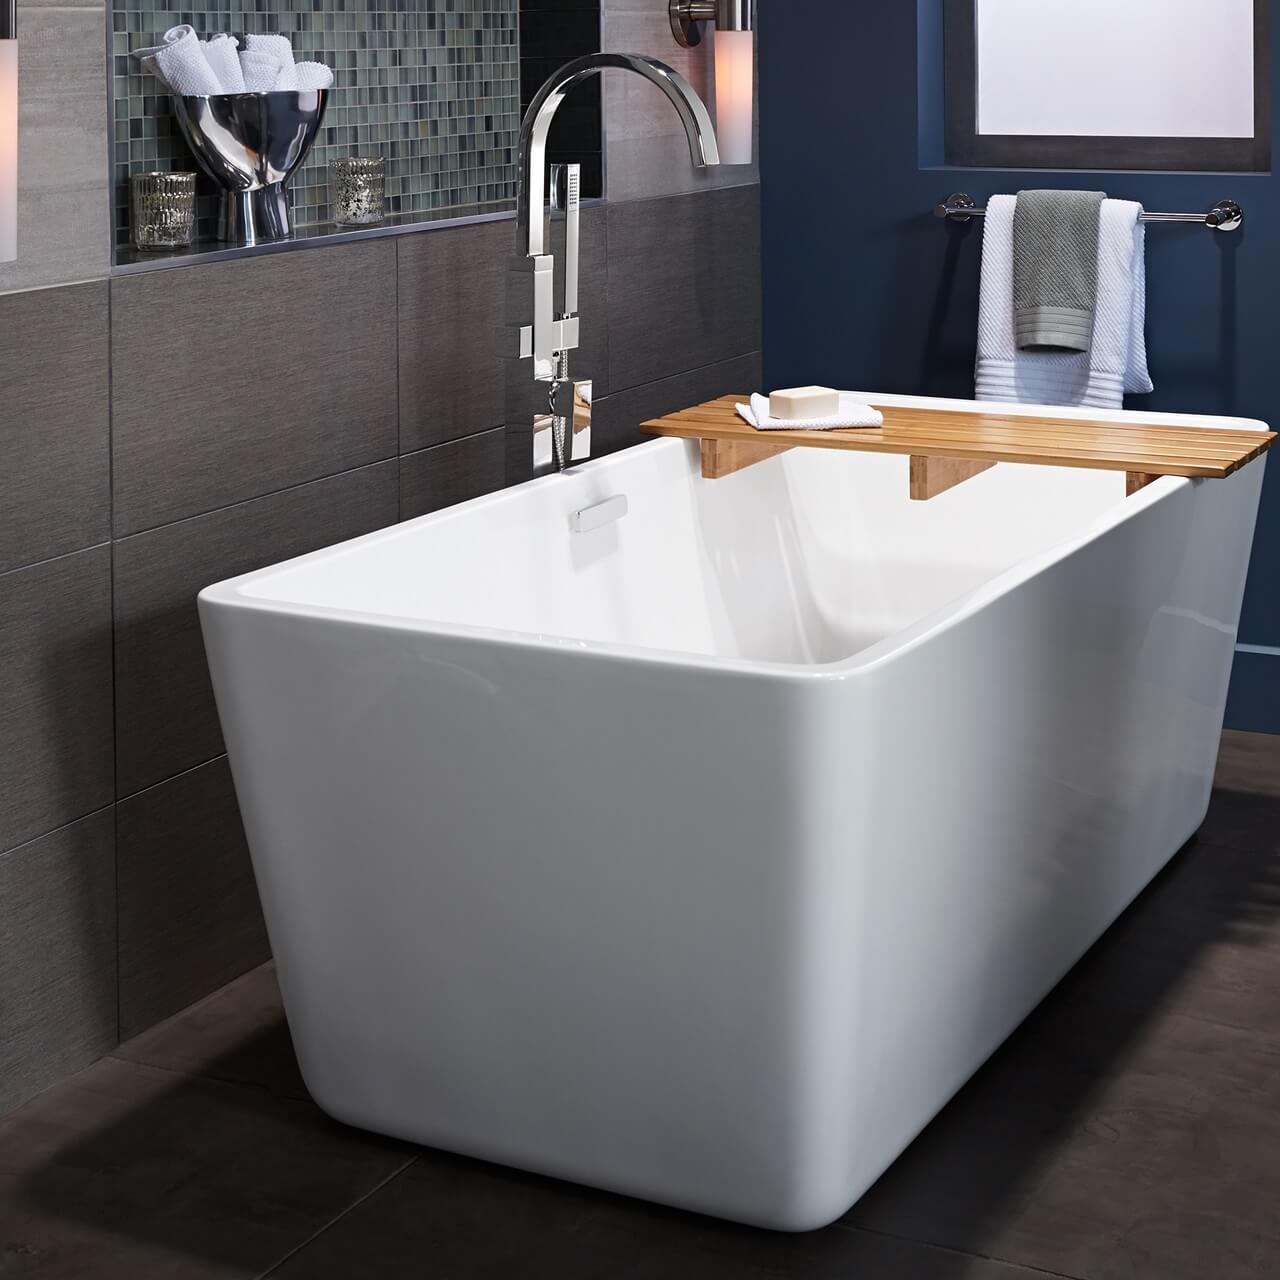 American Standard Sedona Loft Freestanding Tub Allied